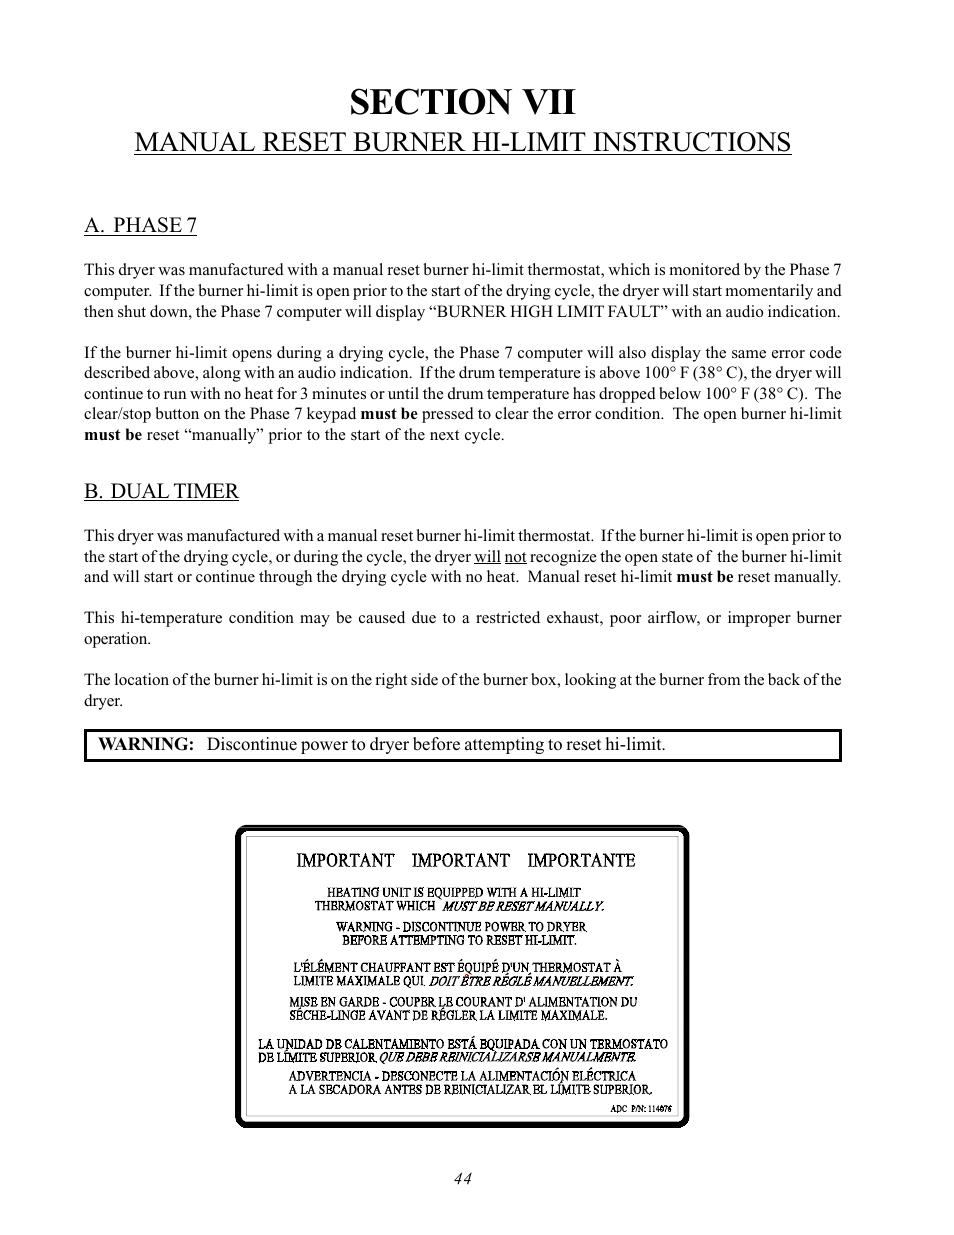 A. phase 7 b. dual timer, Manual reset burner hi-limit instructions   ADC  AD-170SE User Manual   Page 48 / 58